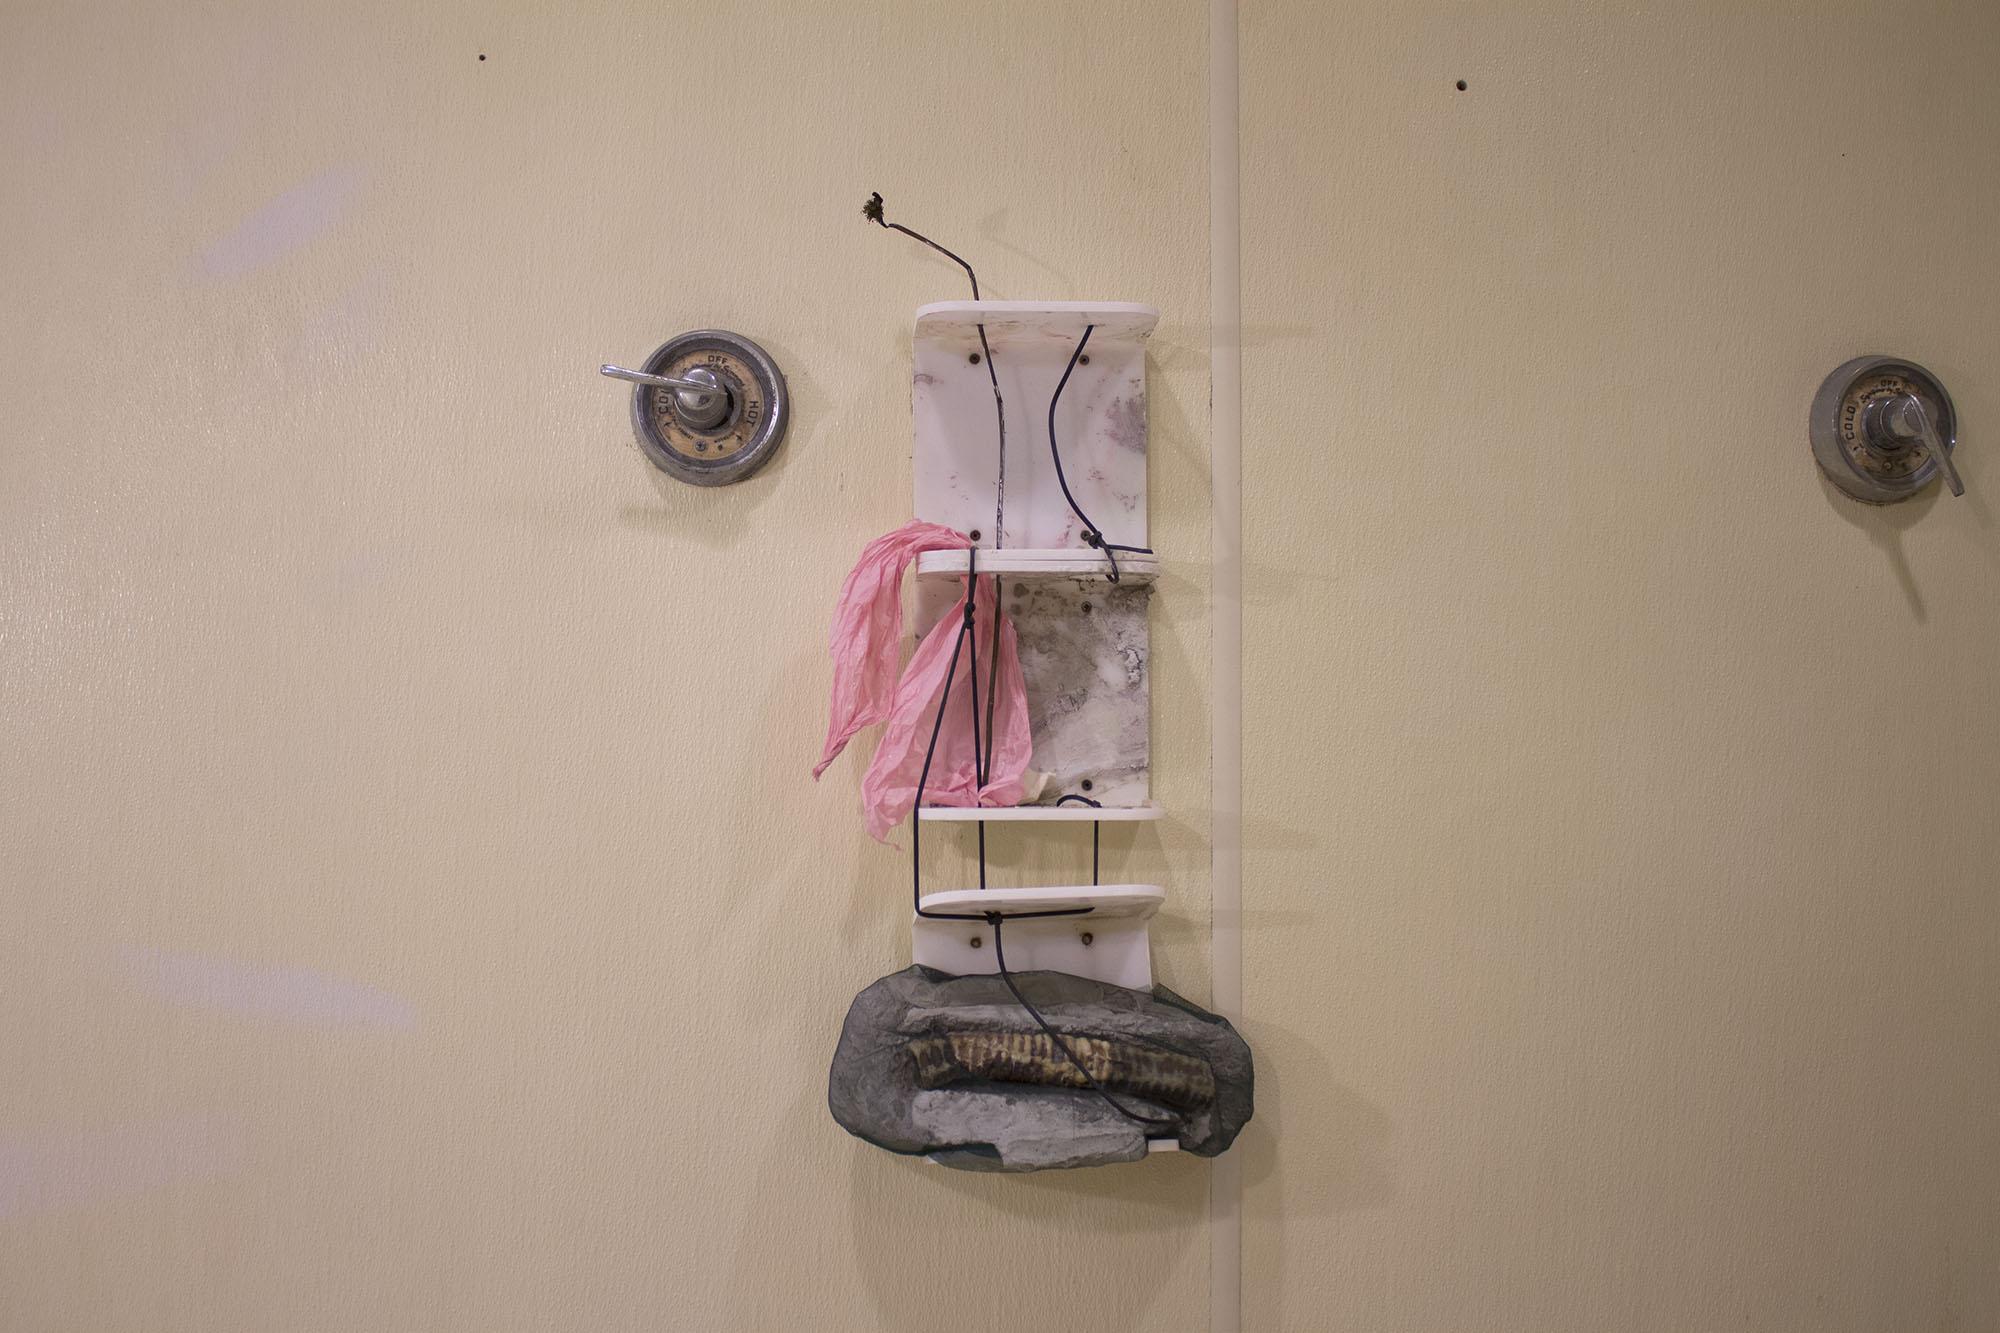 Singing    rose stem, tissue paper, concrete, mesh fabric, dried cow trachea, plastic shower caddies, iridescent pigment, plastic cord